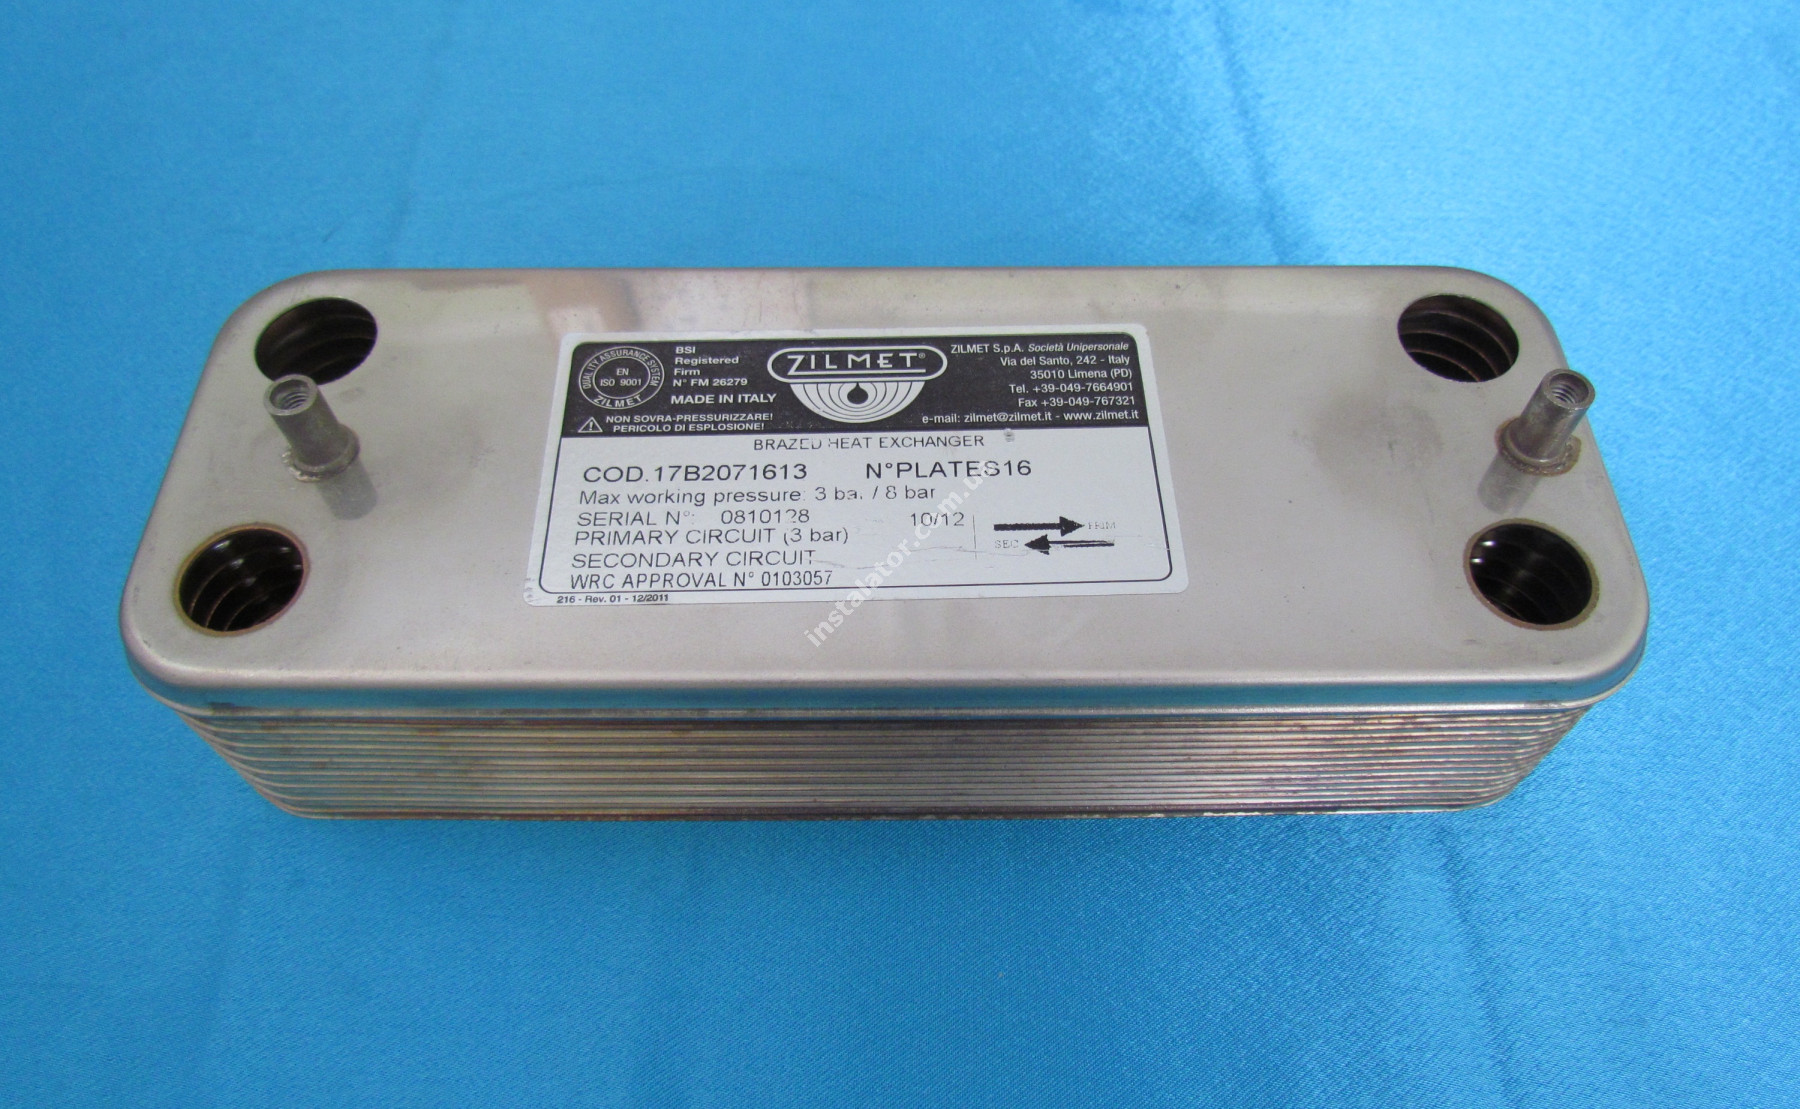 17B2071213 Теплообмінник вторинний ГВП 12 пластин SAUNIER DUVAL Themaclassic, Combitek ZILMET full-image-0